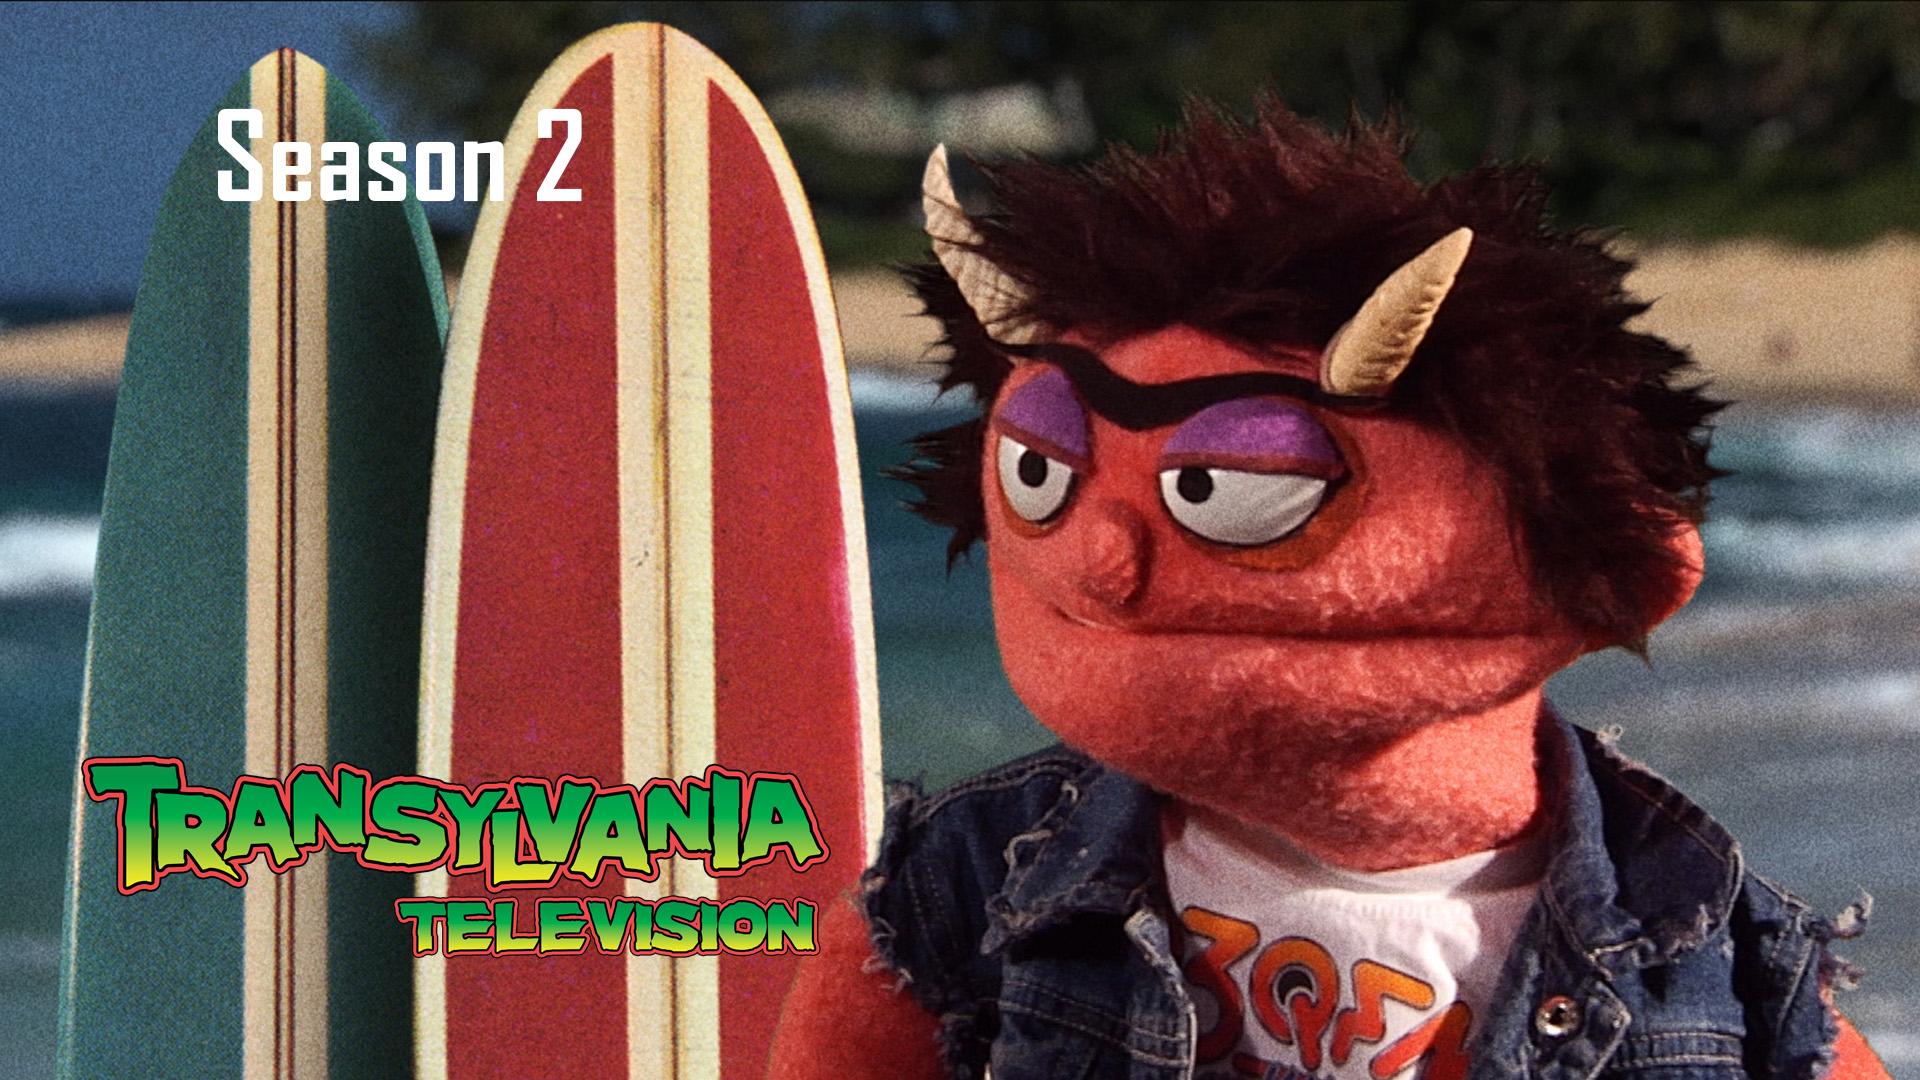 Transylvania Television 2